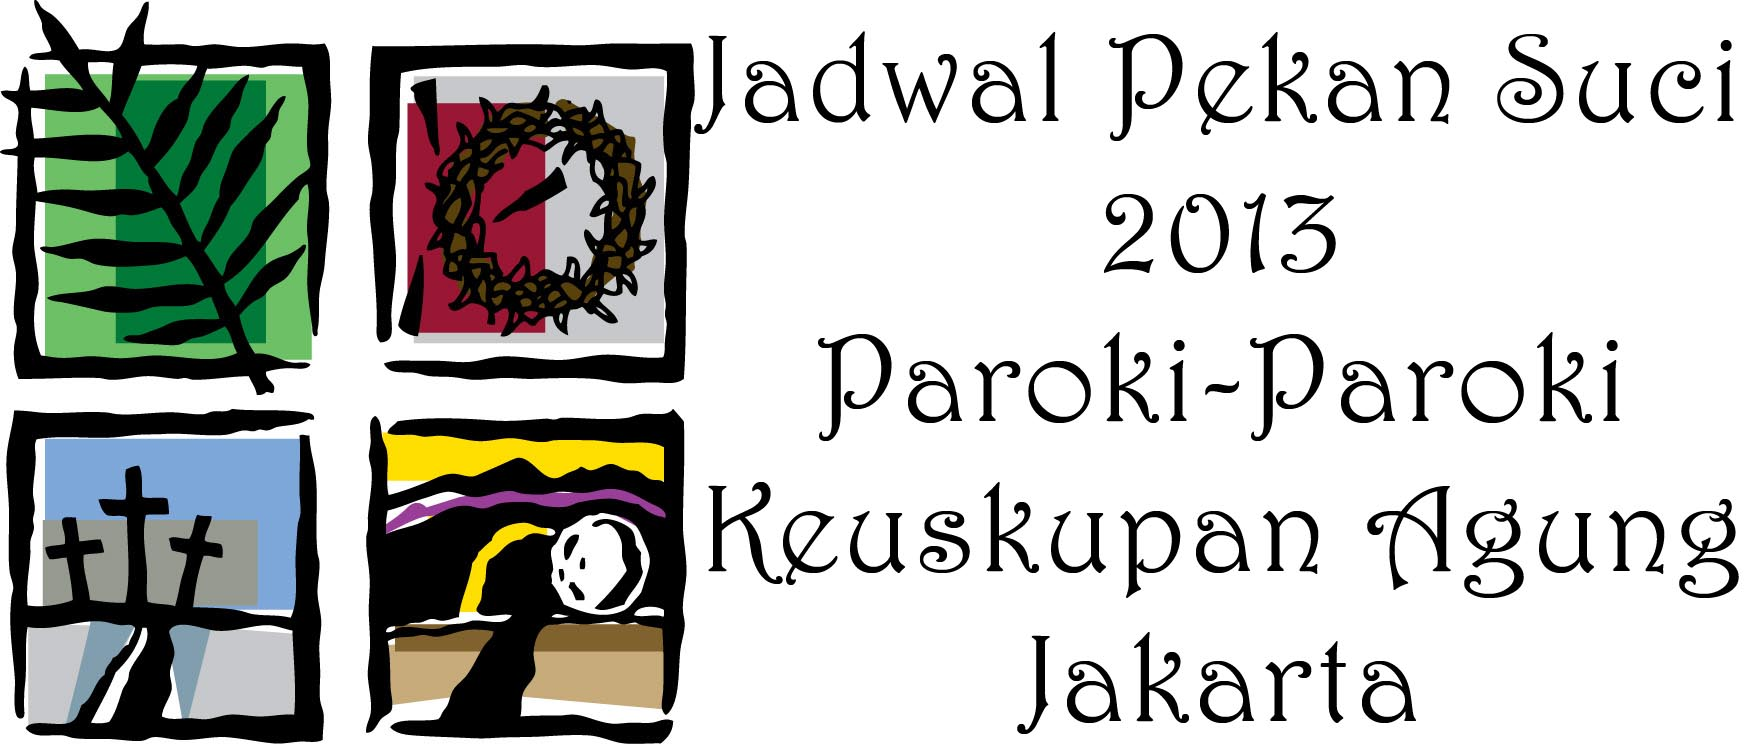 jadwal pekan suci 2013 paroki keuskupan agung jakarta, kaj, jadwal misa paskah, kamis putih, jumat agung, 2013